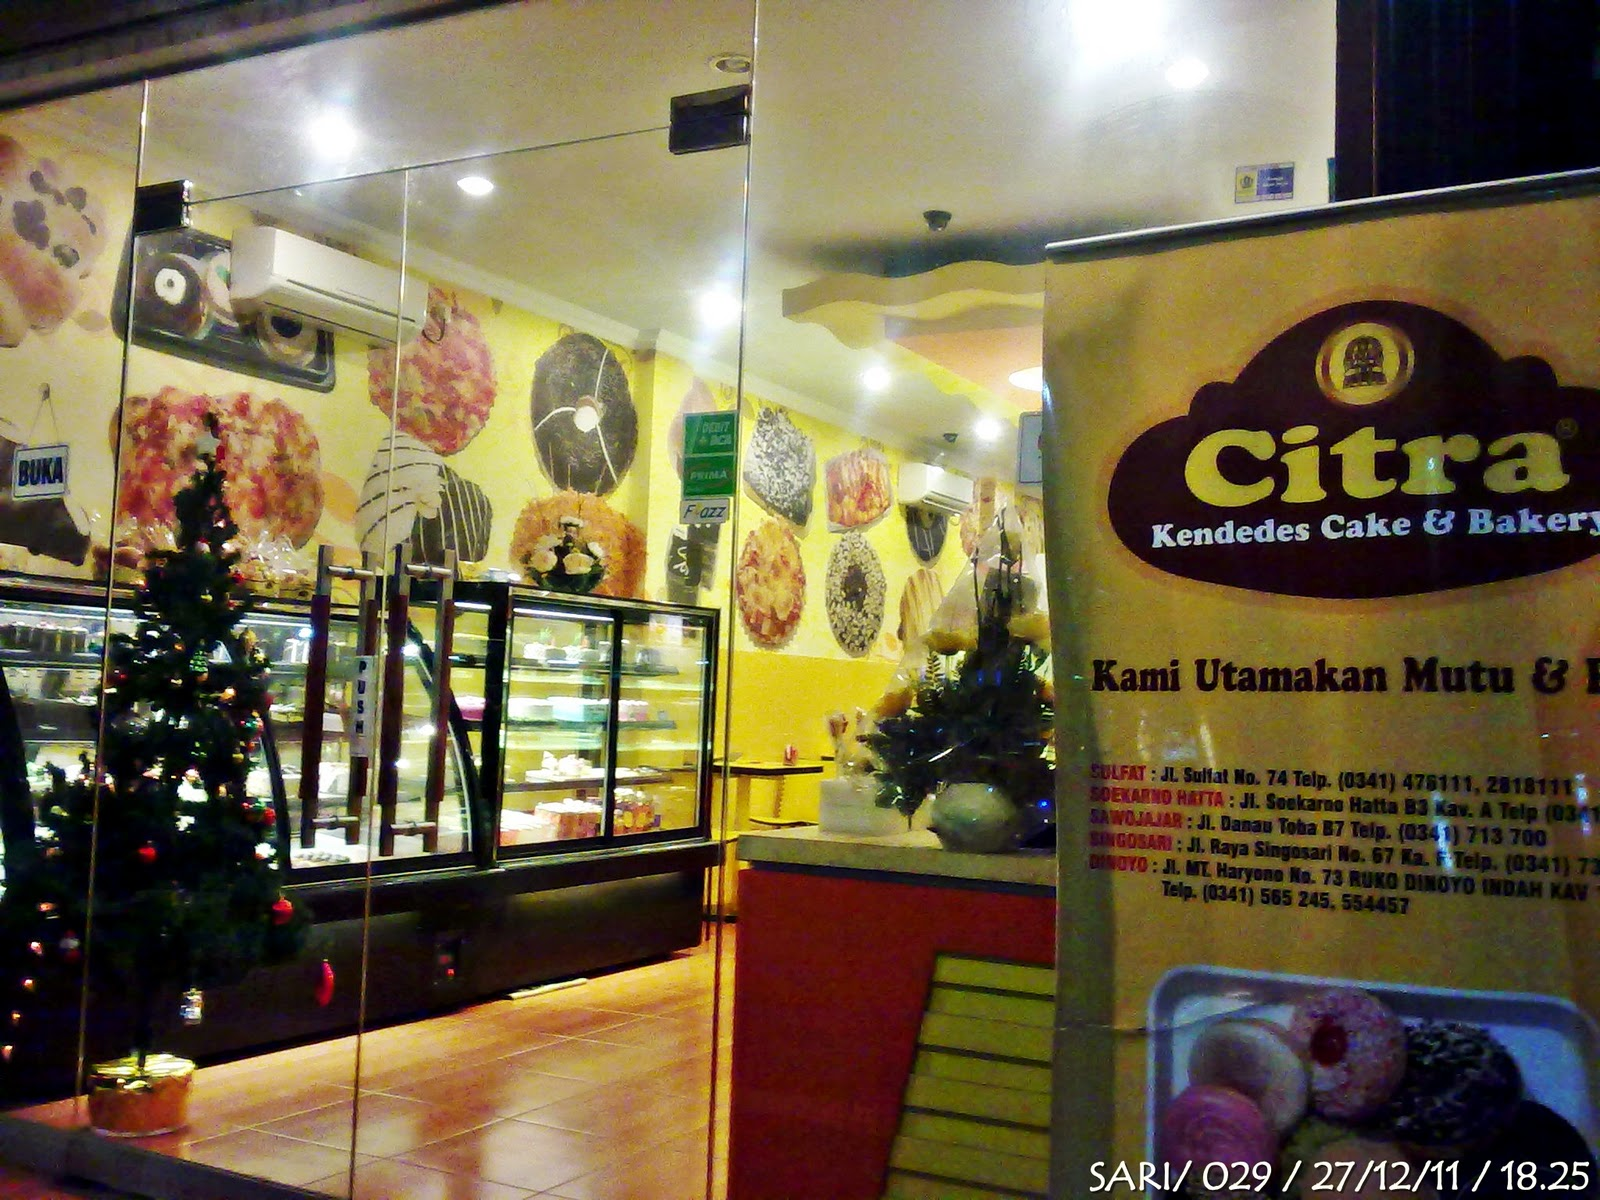 Kue kue unyu di citra kendedes cake and bakery